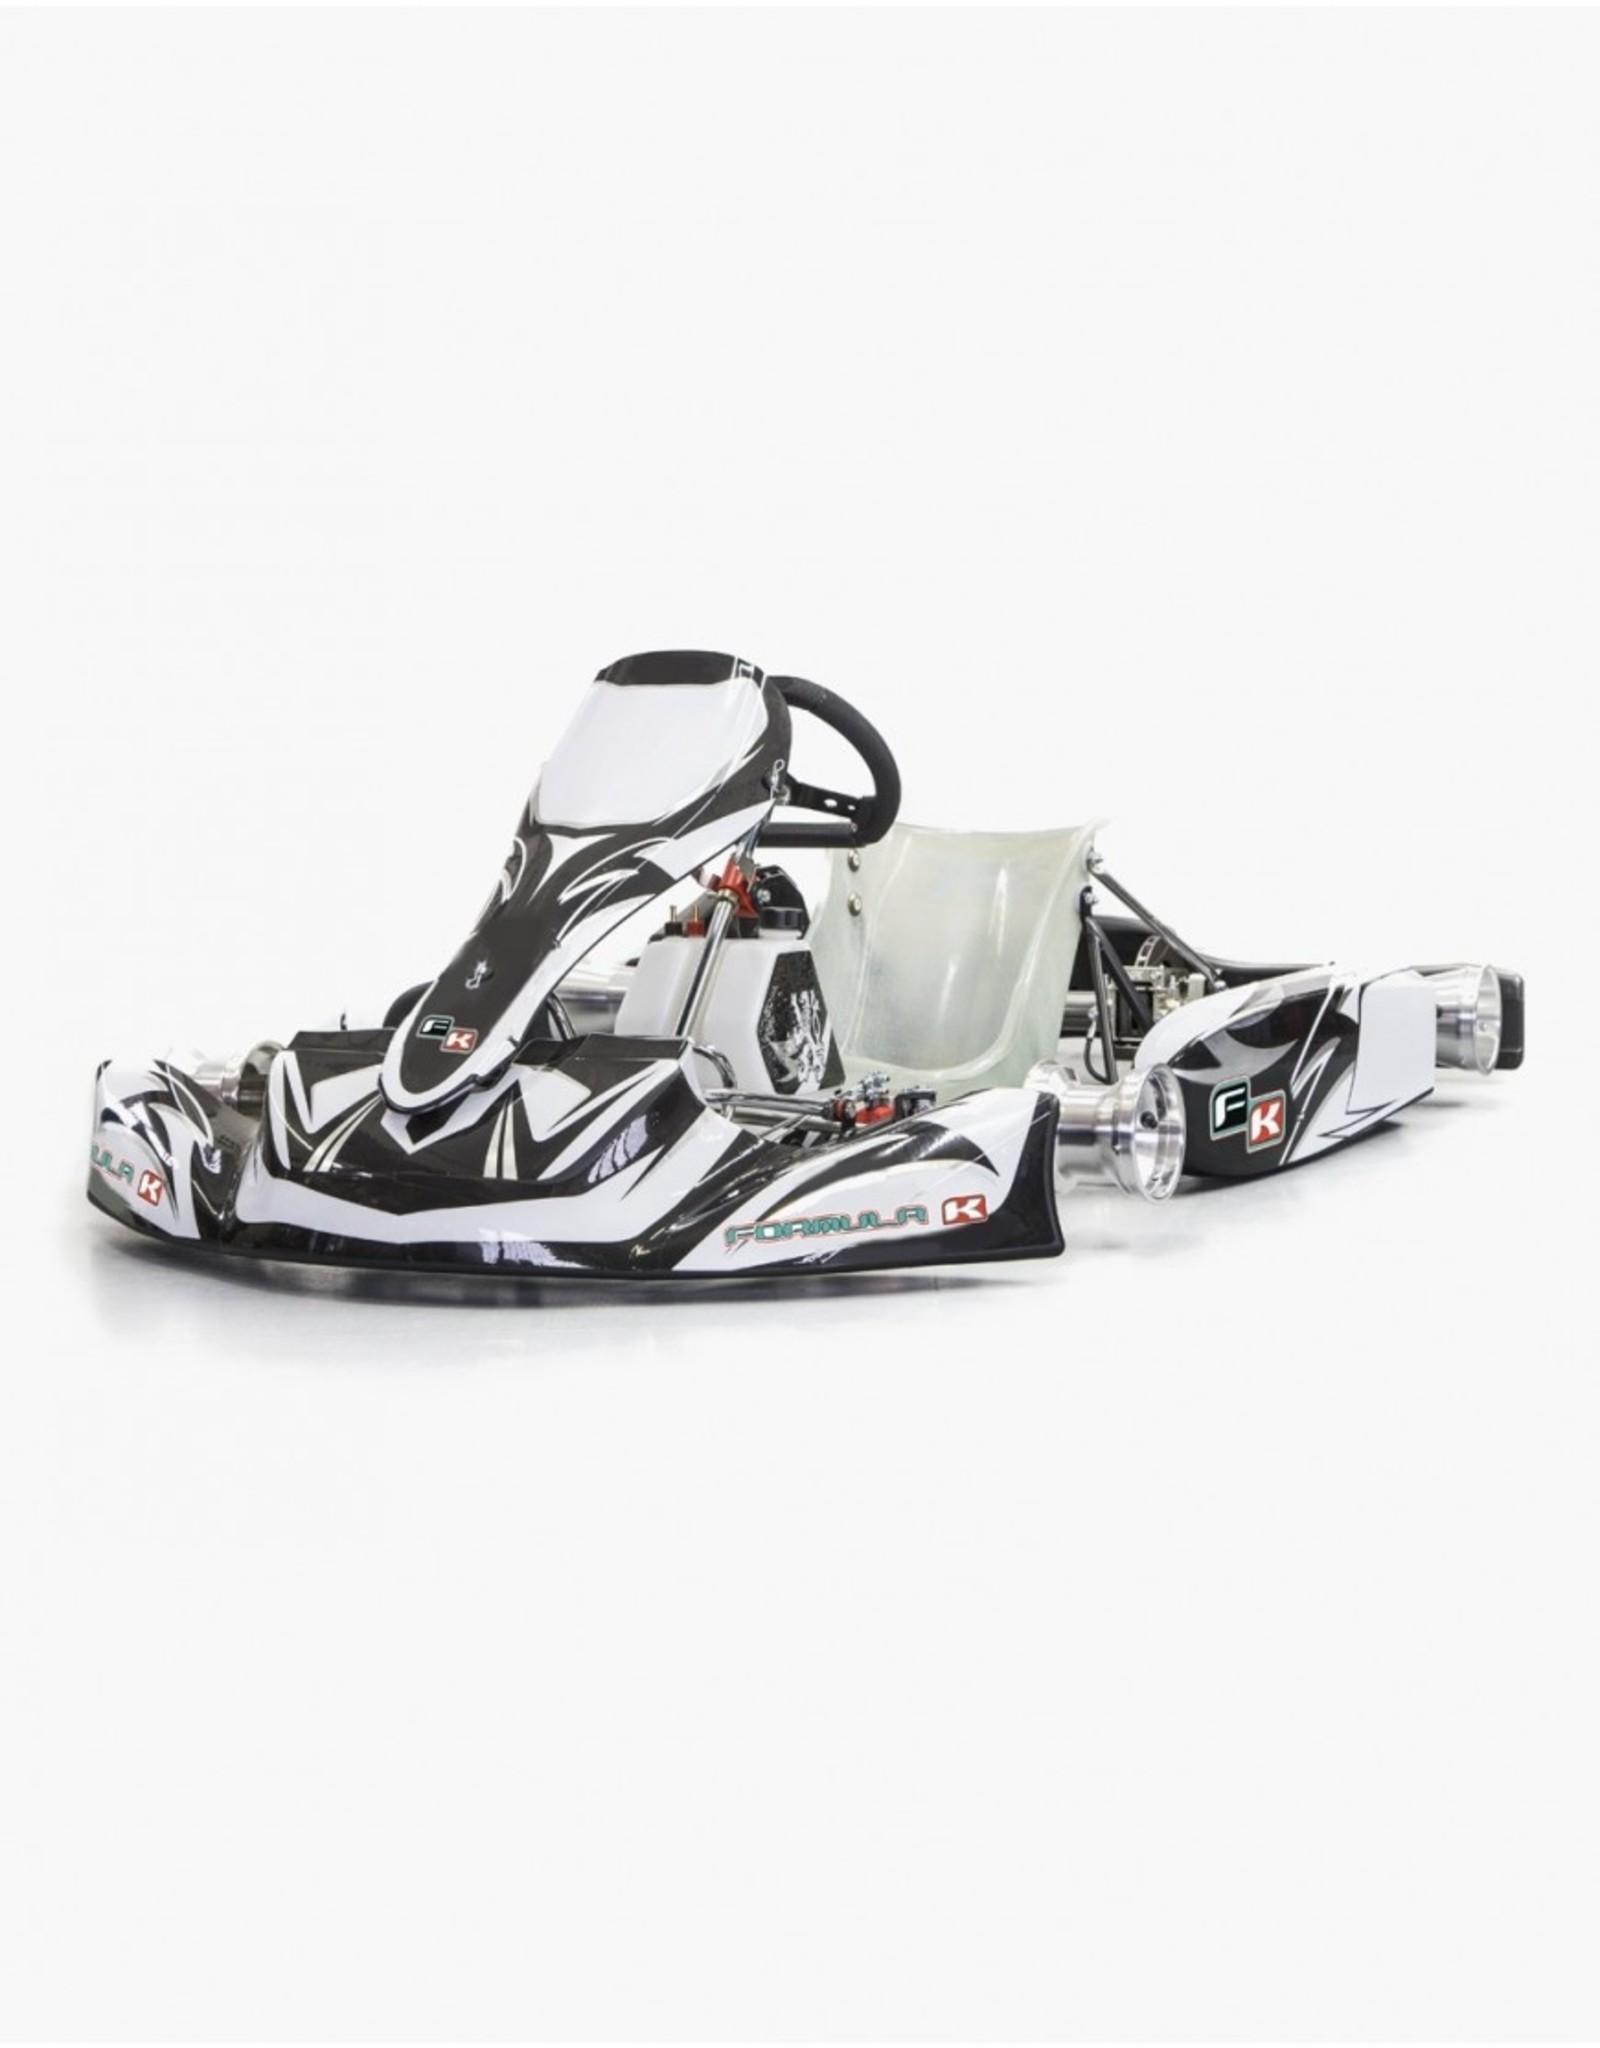 Formula K Formula K Jun/ sen chassis Dark edition